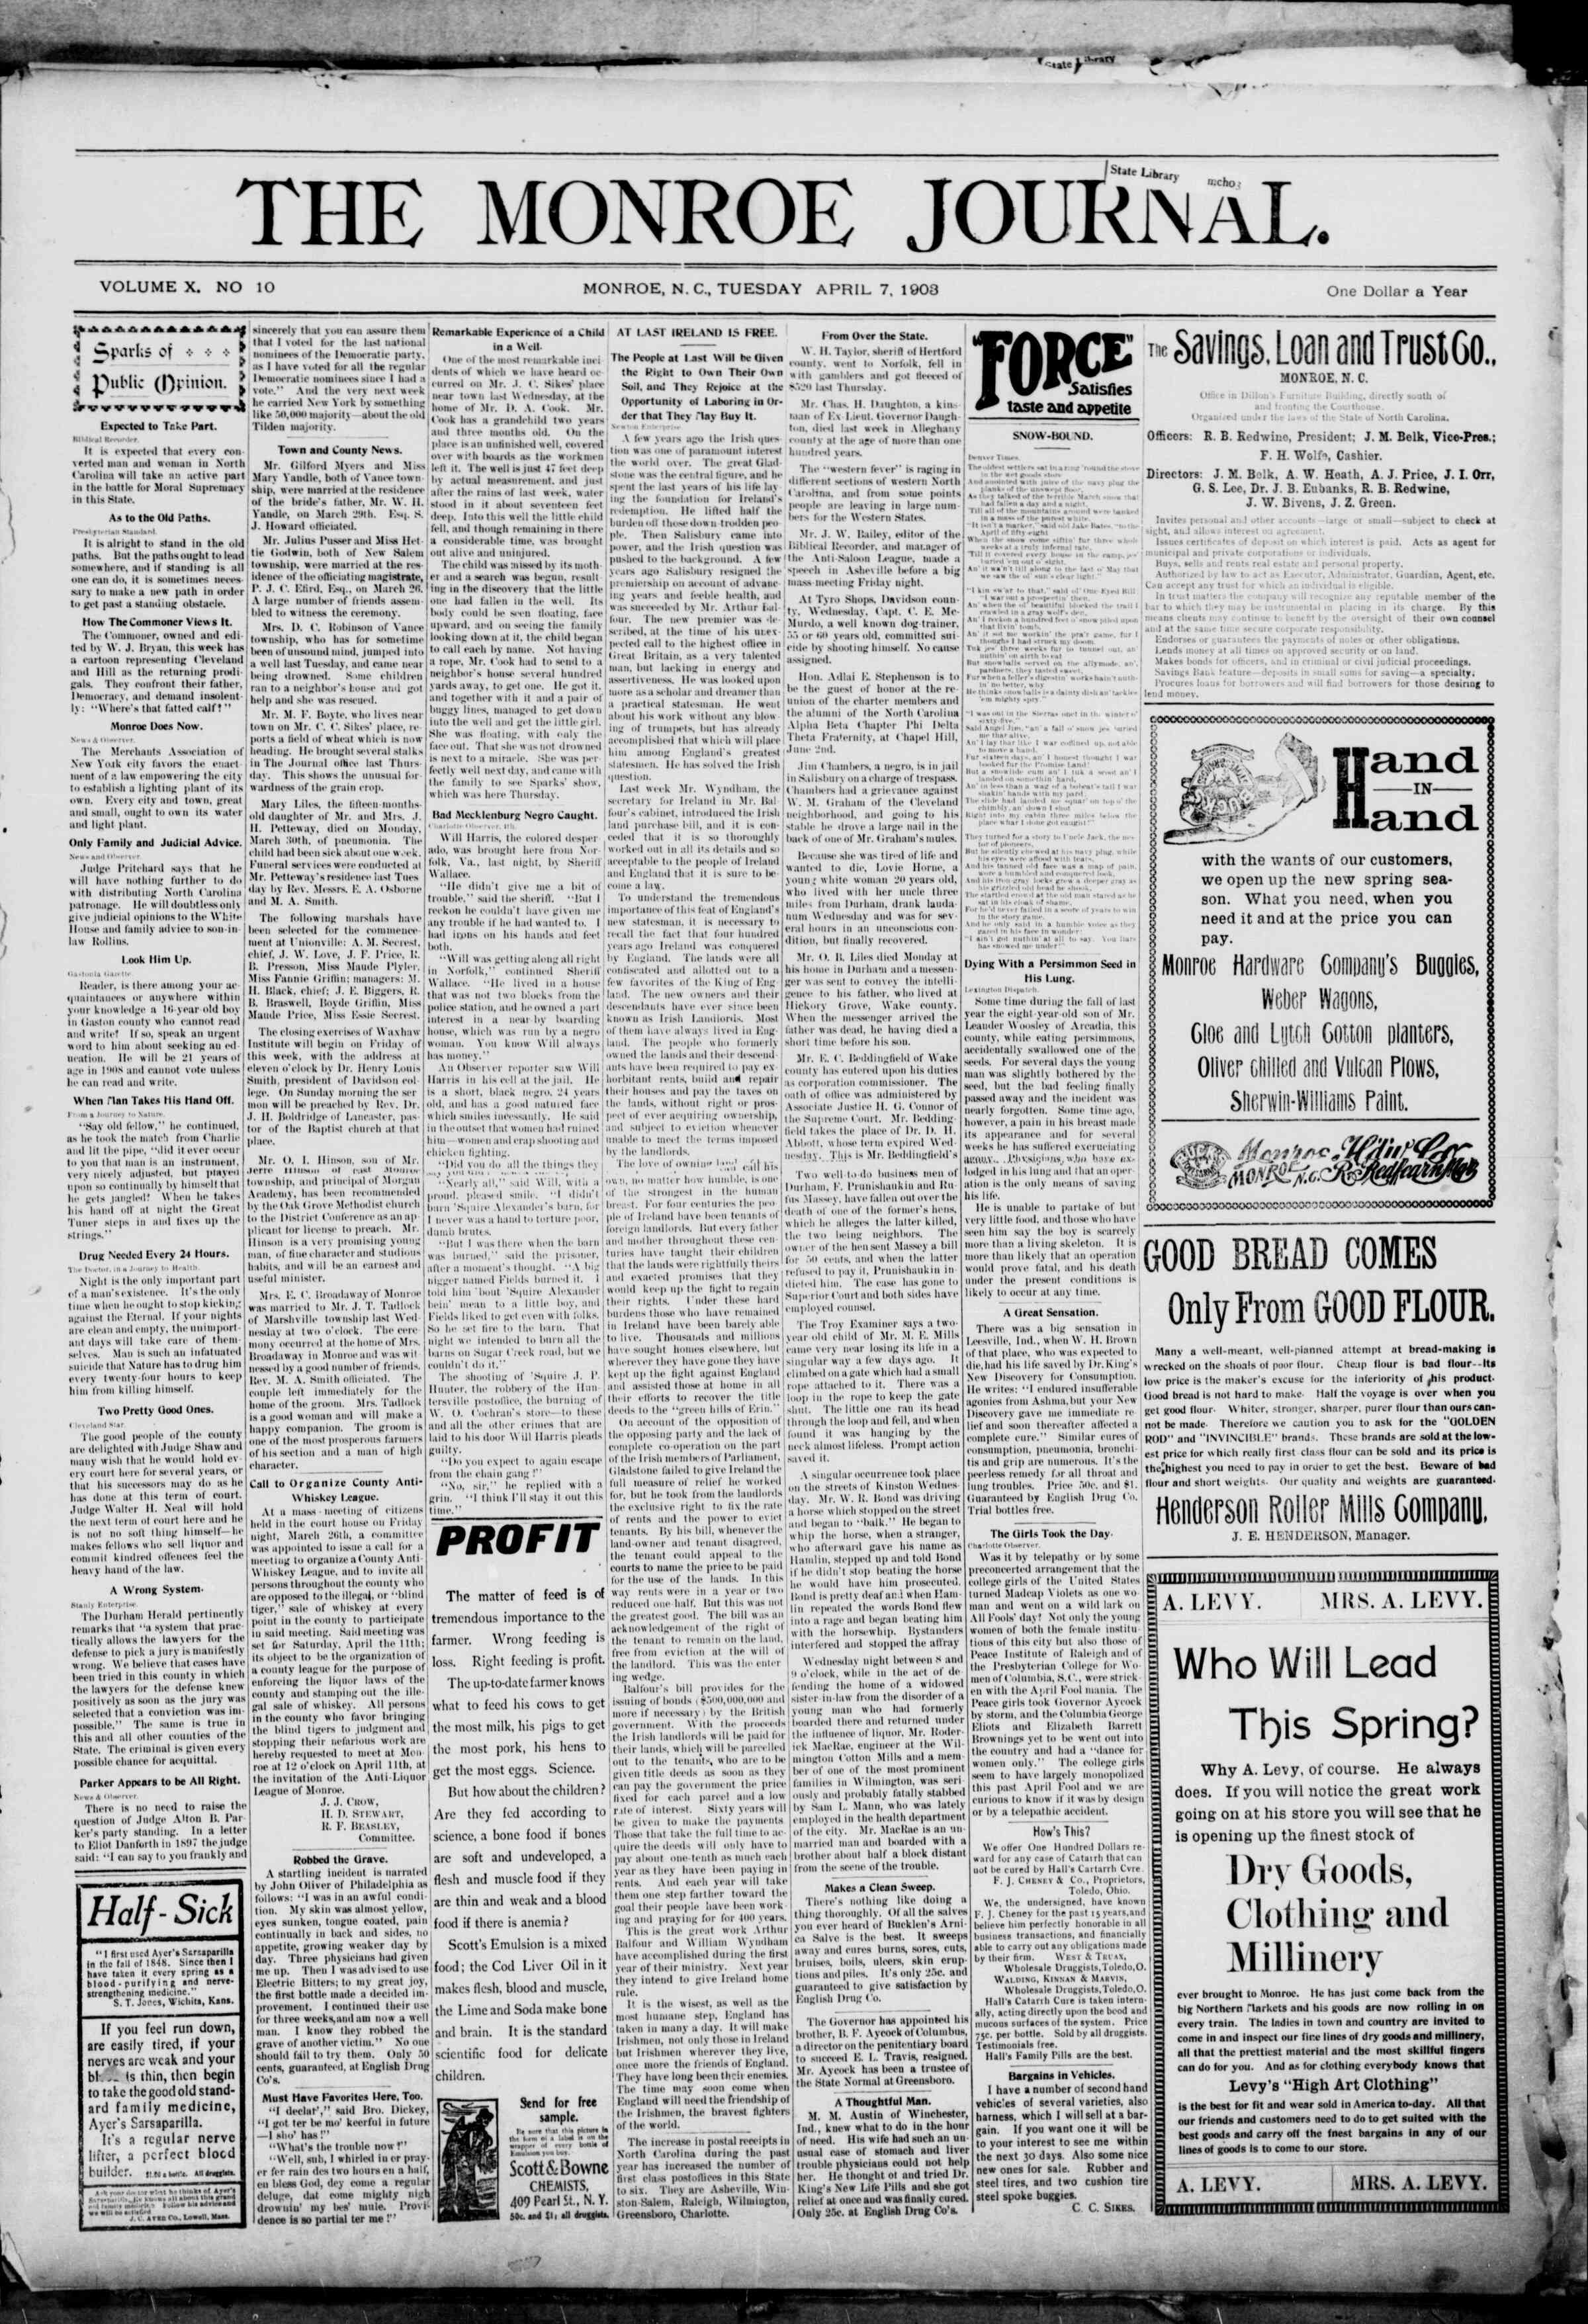 April 7, 1903 Tarihli The Monroe Journal Gazetesi Sayfa 1